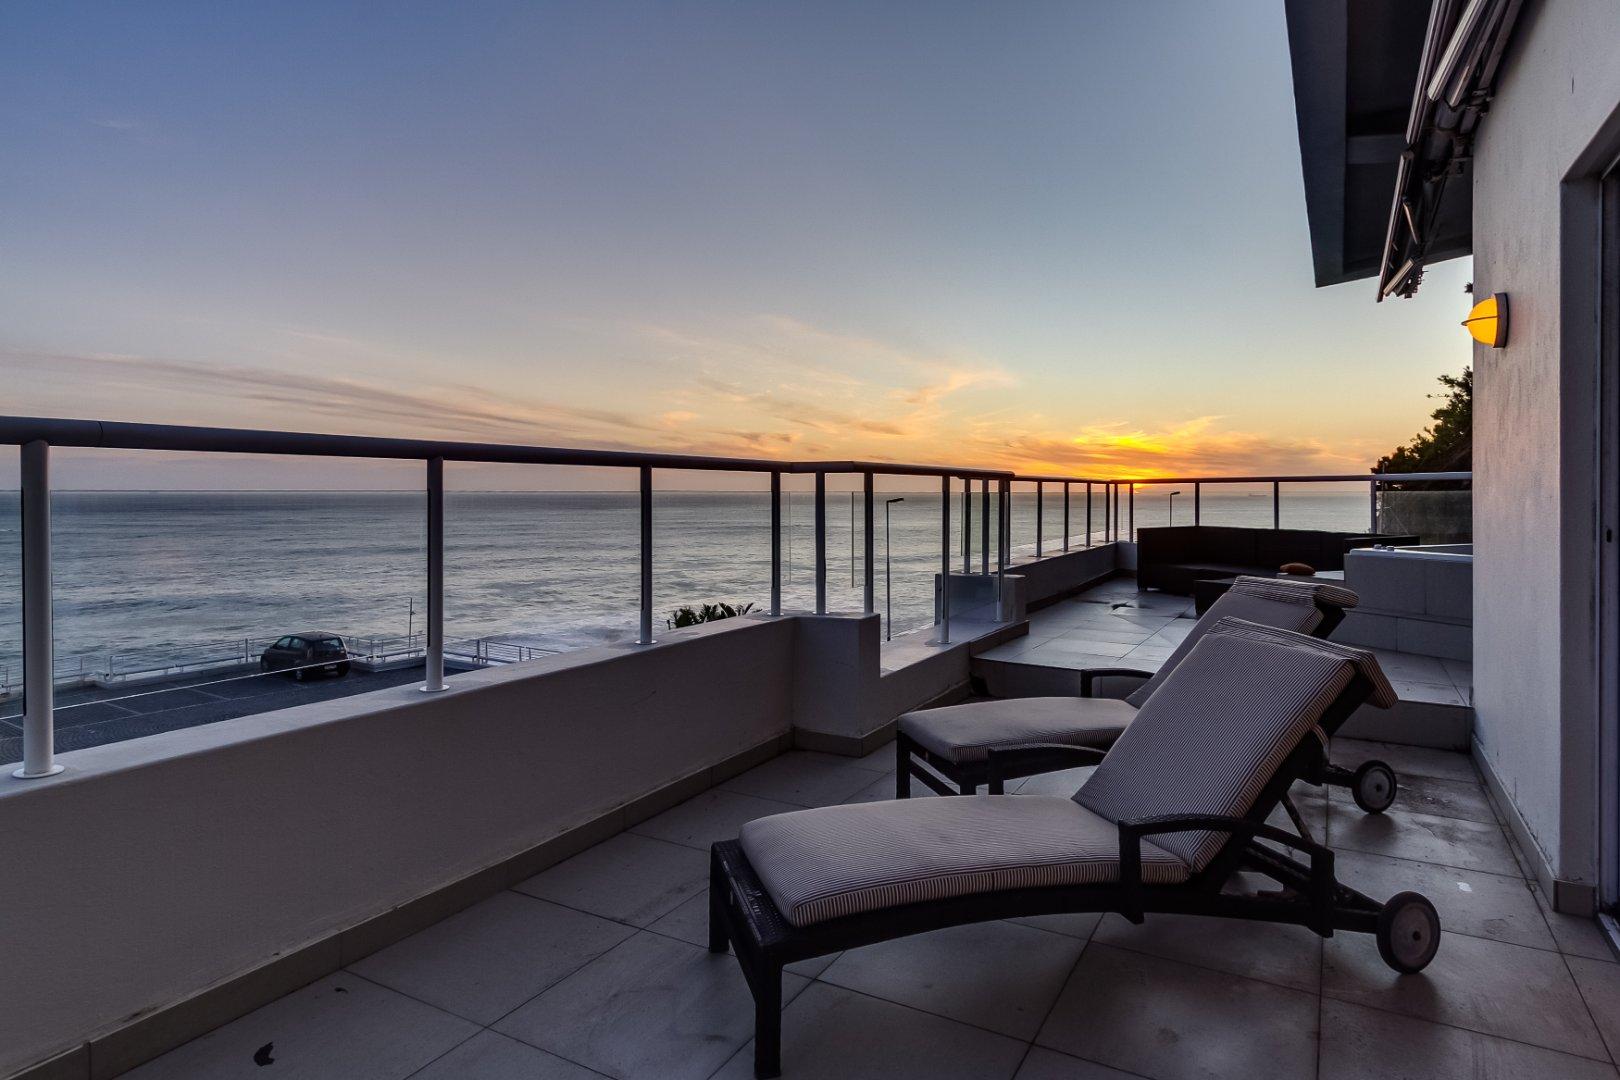 3 Bedroom Ocean Facing Apartment in Clifton